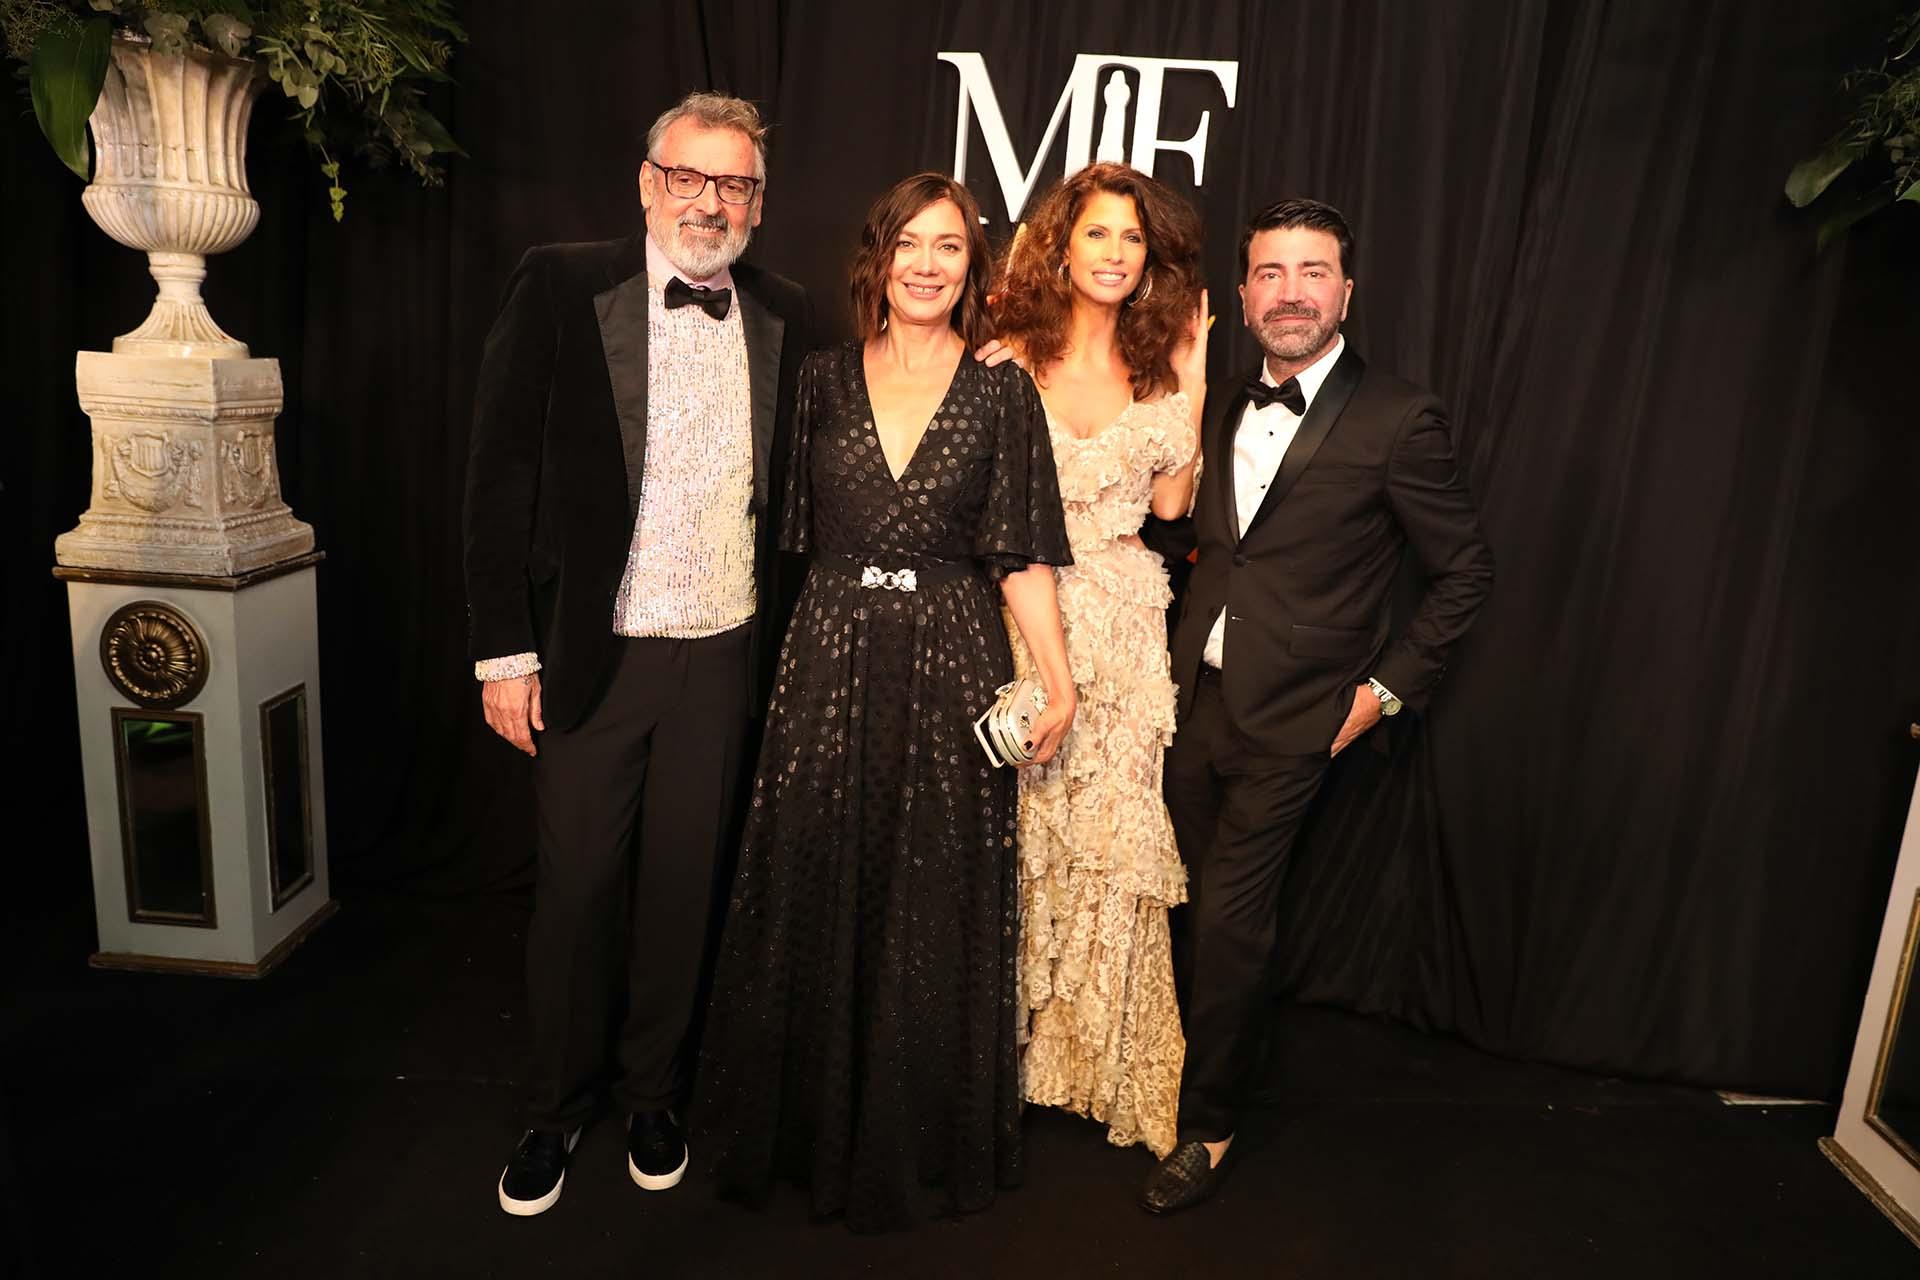 Grupo super top: Benito Fernández, Natalia Antolín, Analía Maiorana y Javier Saiach